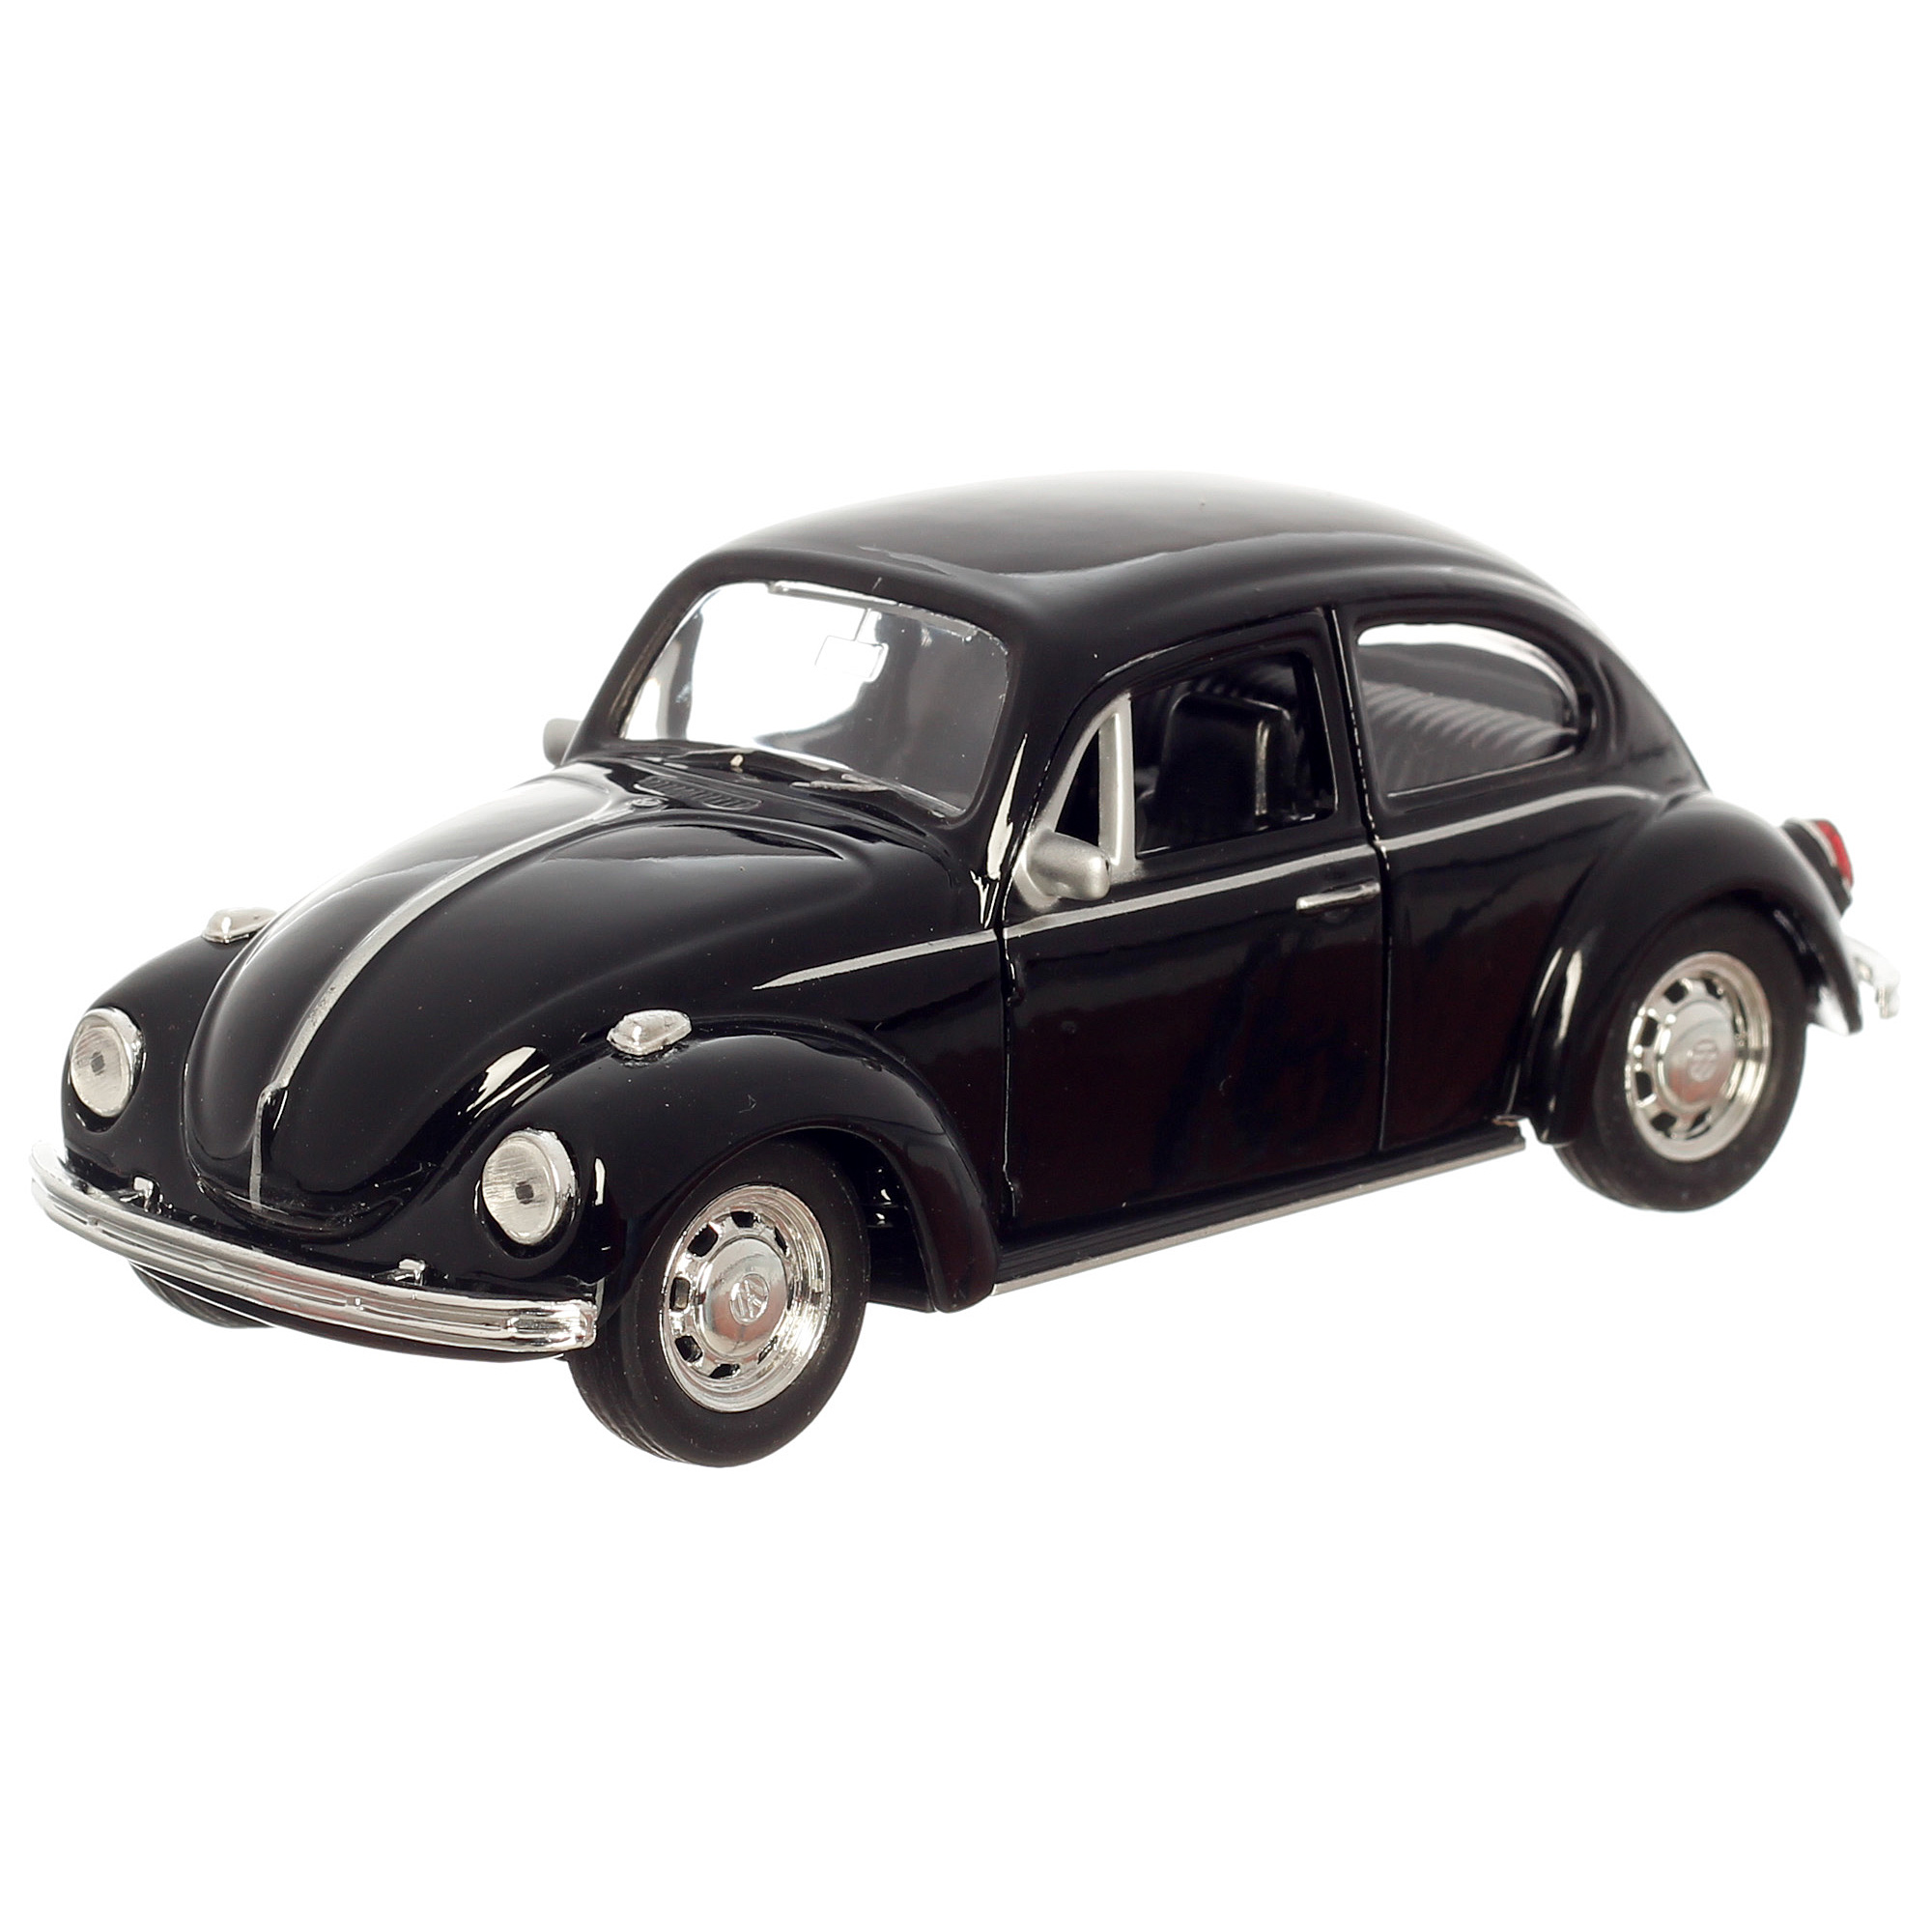 vw k fer metallauto 11cm schwarz modellauto ebay. Black Bedroom Furniture Sets. Home Design Ideas